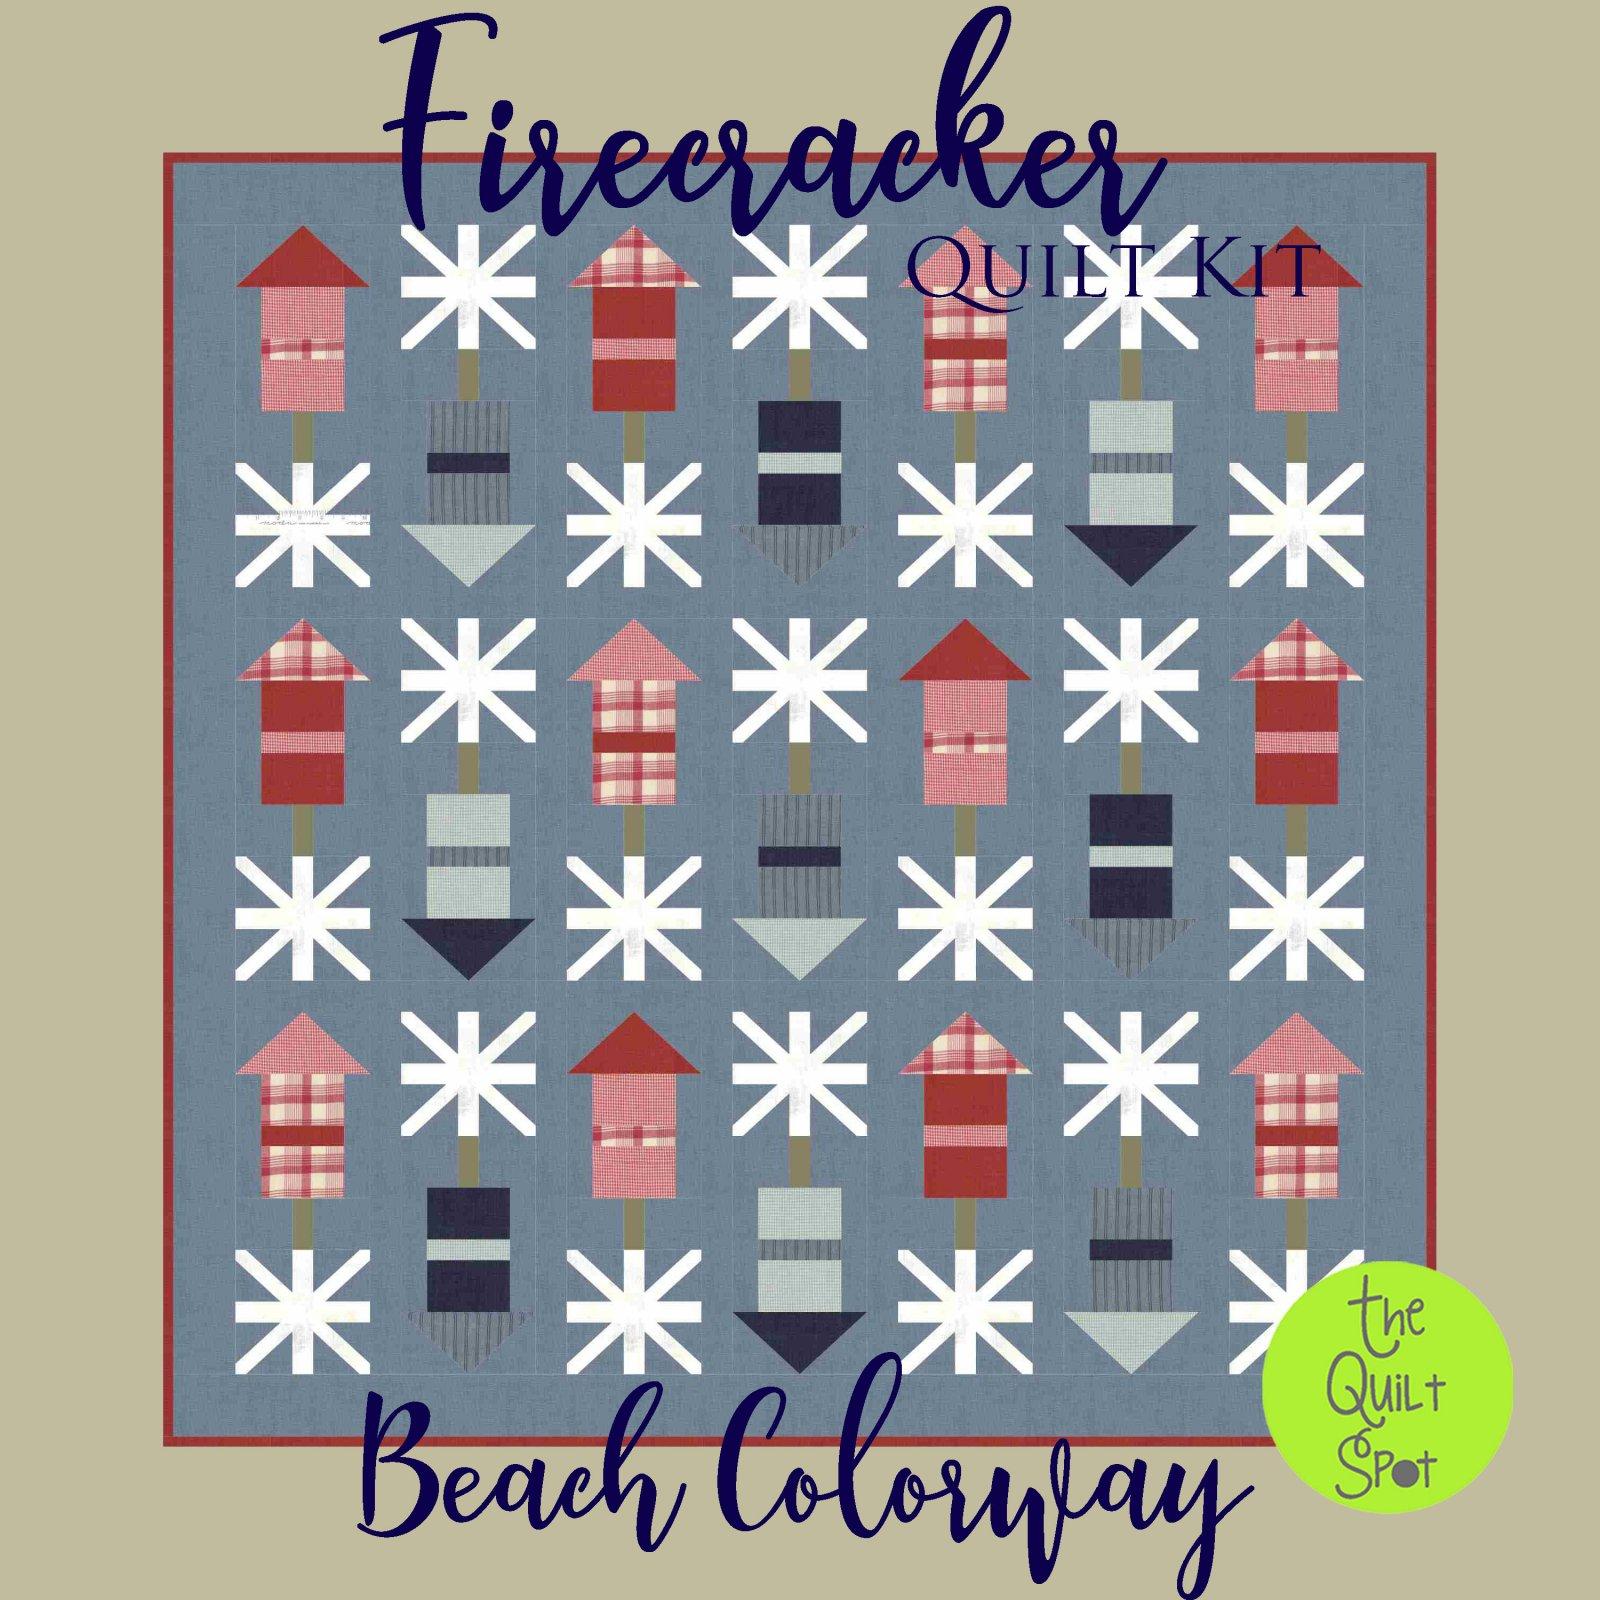 Firecracker Quilt Kit - Beach Colorway - Fabric Only